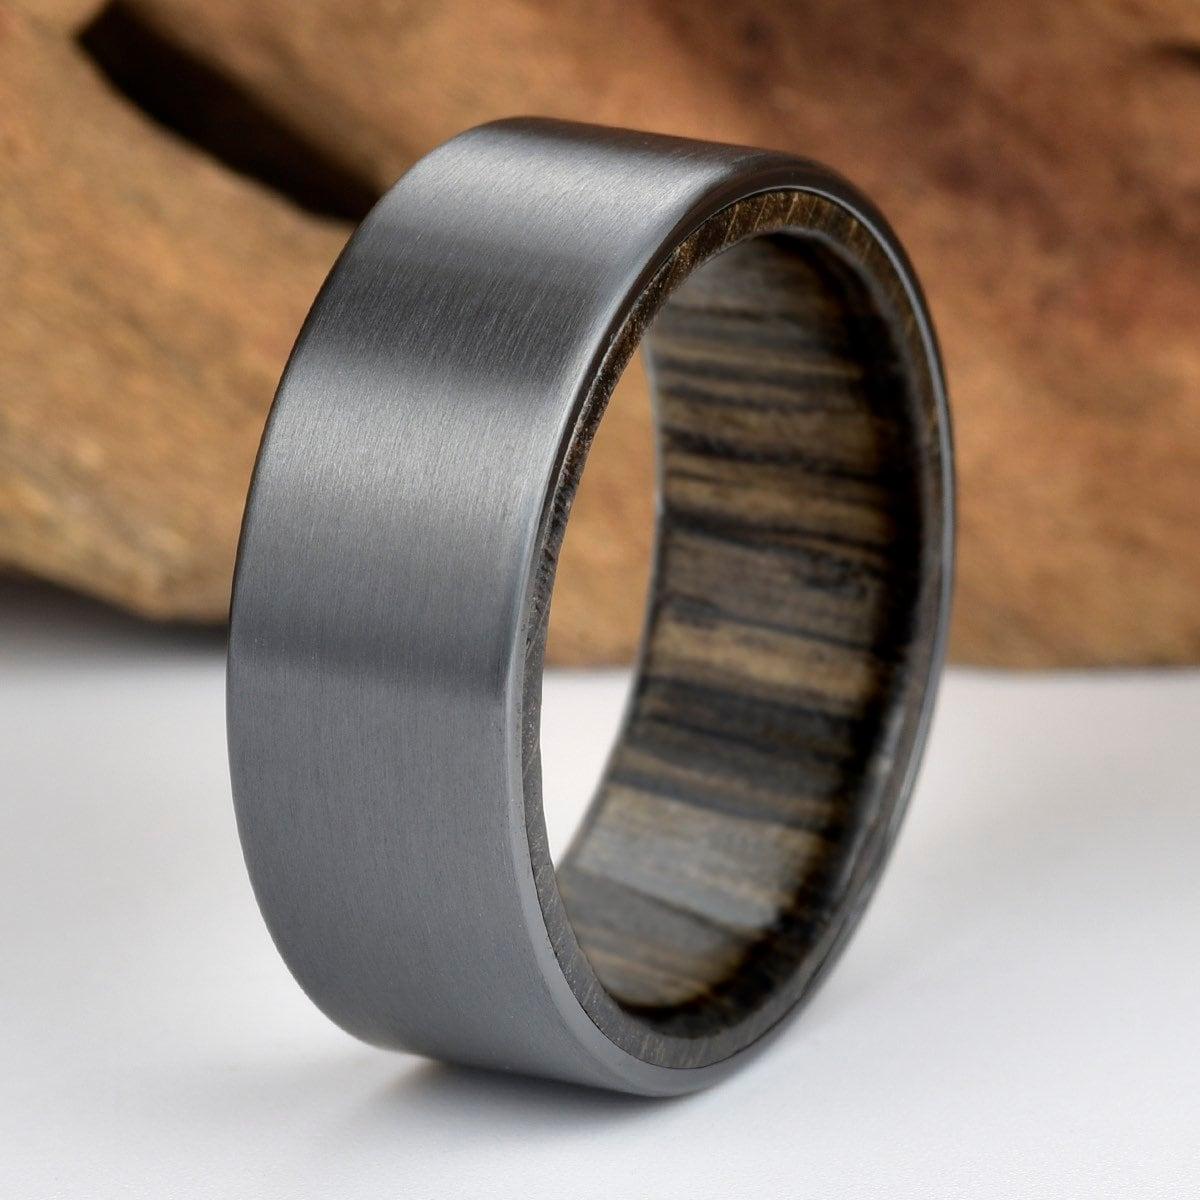 50: Ancient Christian Wedding Rings At Reisefeber.org